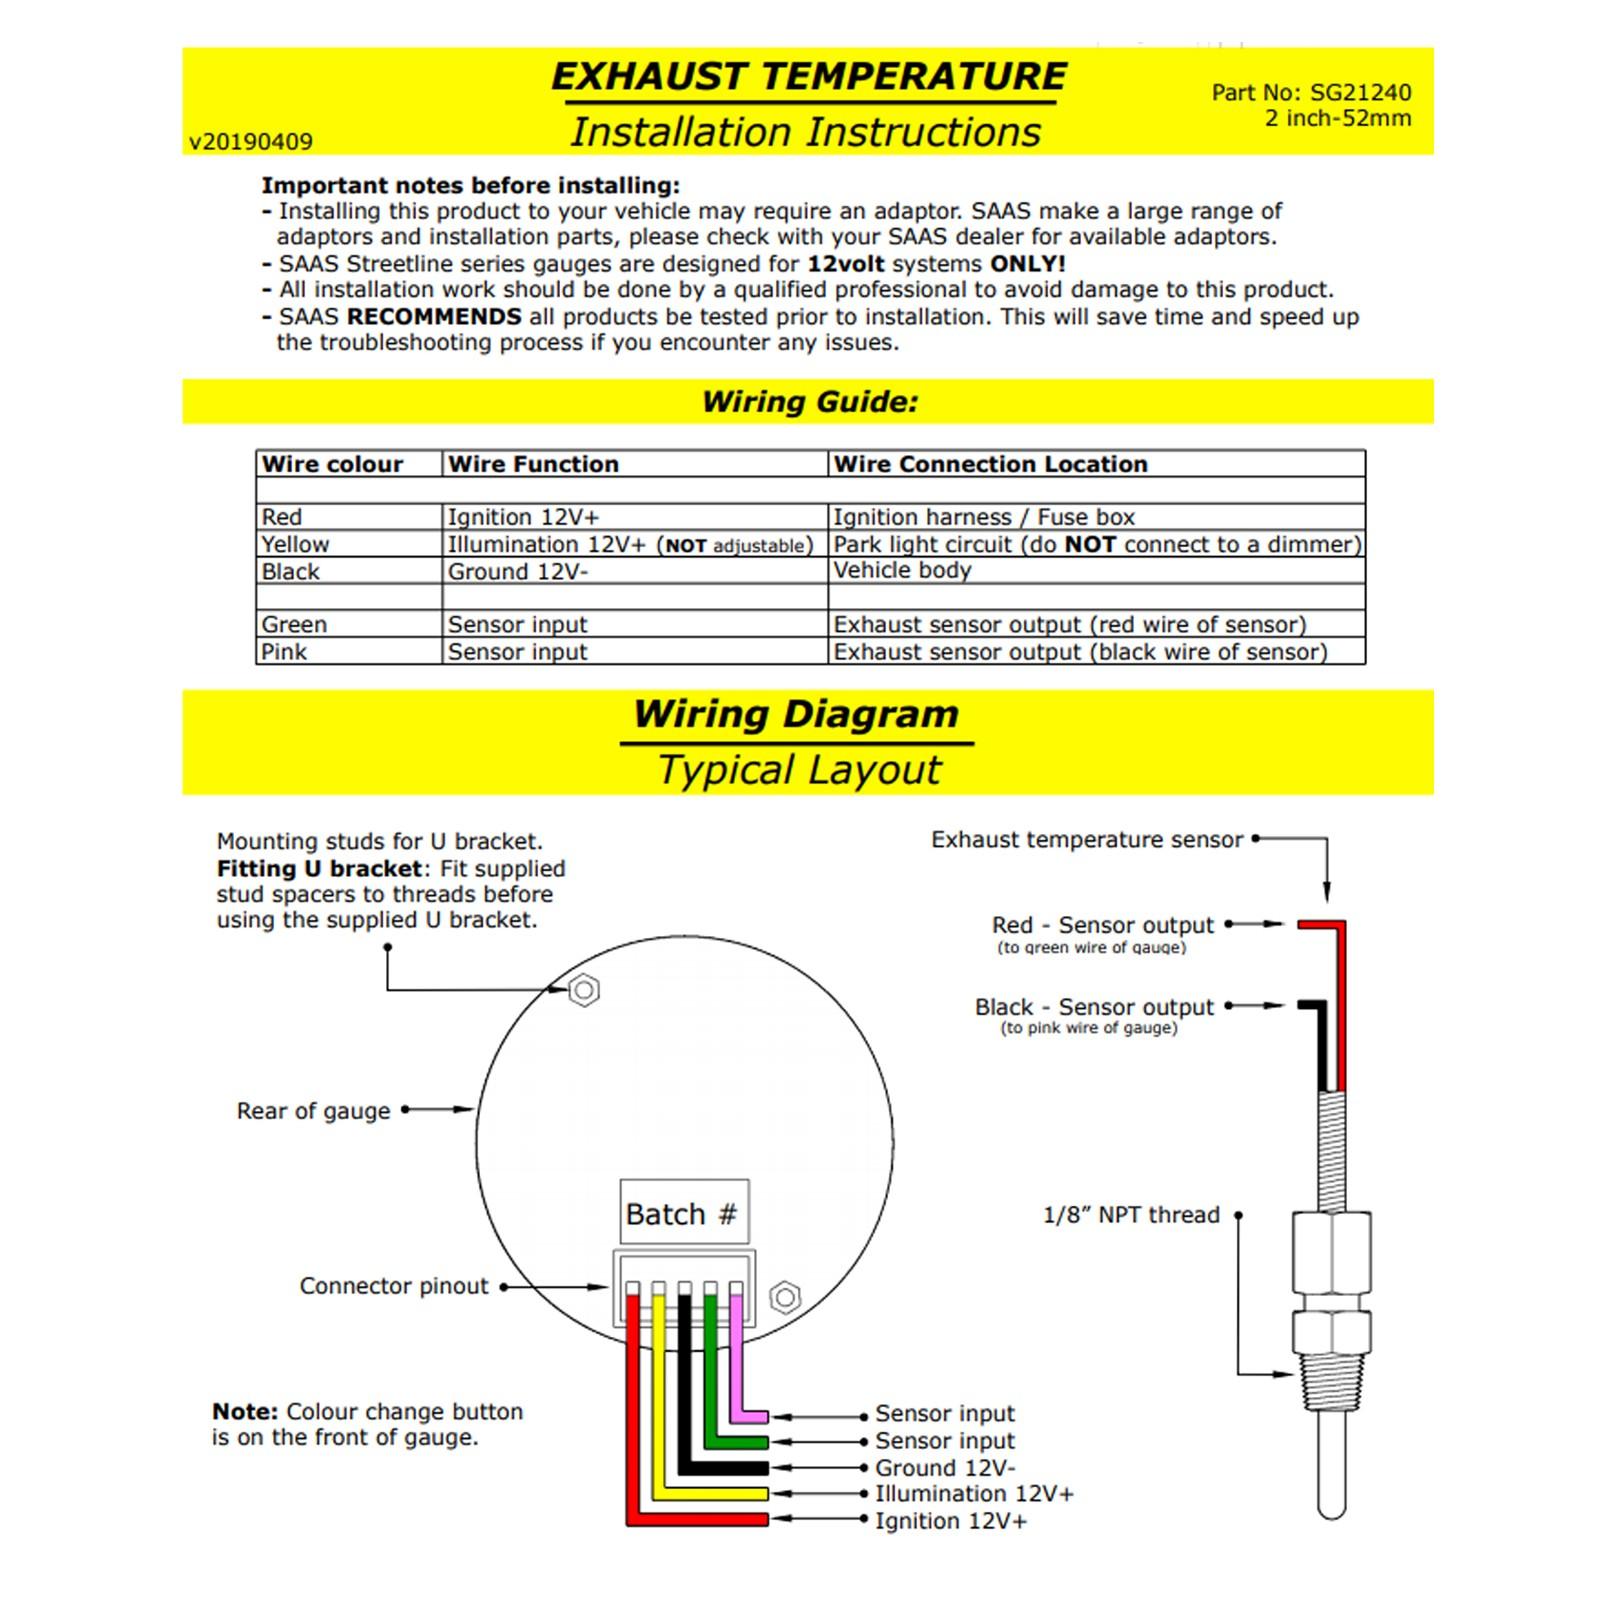 Vdo Oil Pressure Gauge Wiring Instructions 8aecf Fuel Pressure Gauge Wiring Diagram Of Vdo Oil Pressure Gauge Wiring Instructions Wiring Diagram Oil Pressure 1992 Lumina